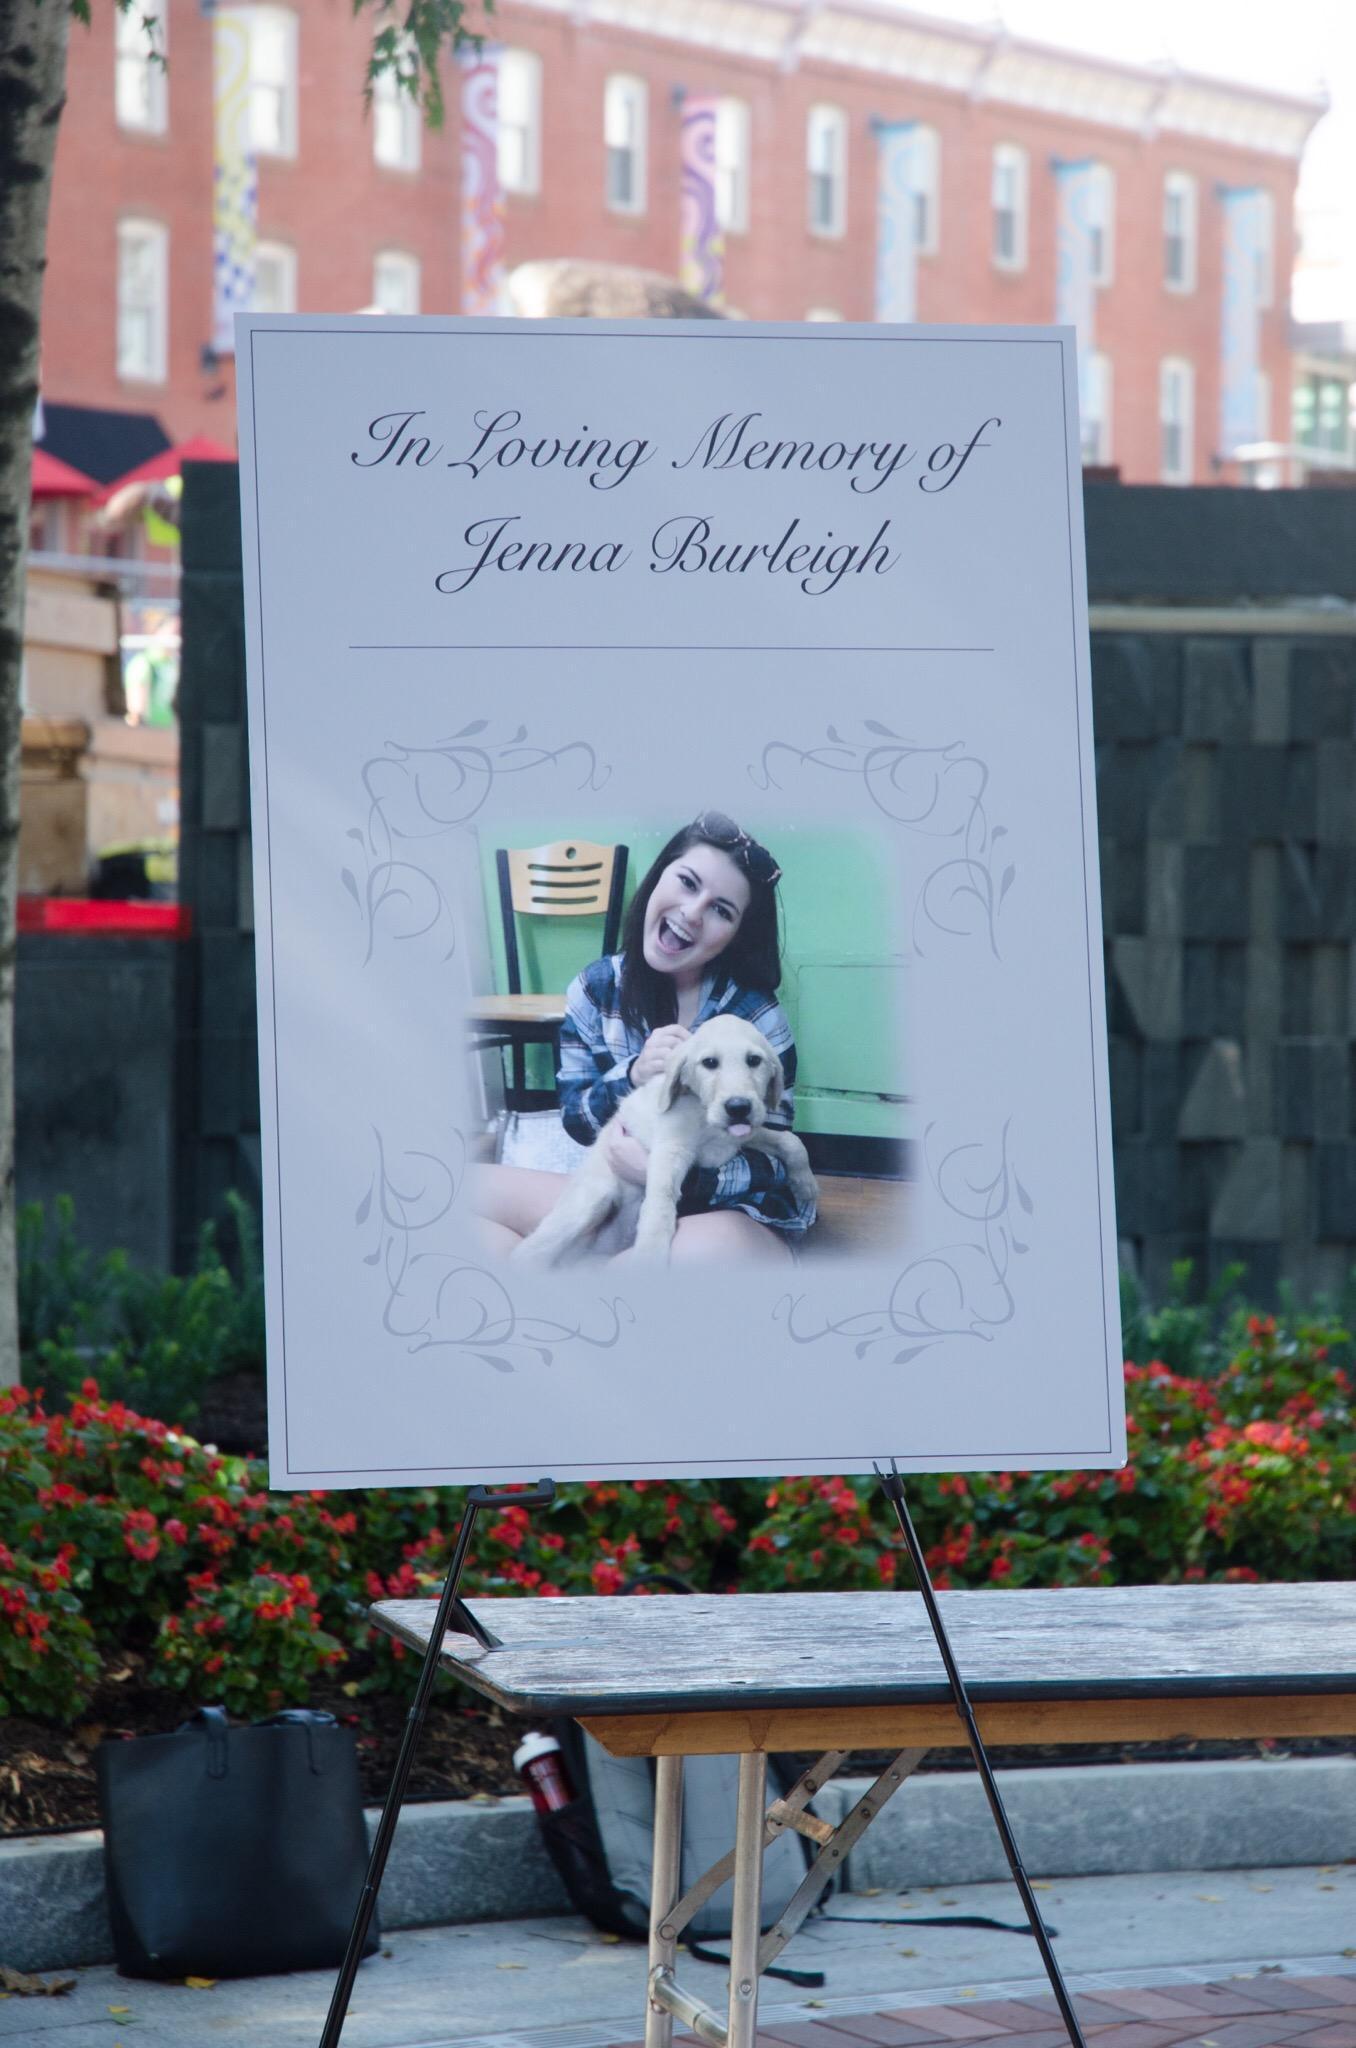 Temple University held a public vigil for Jenna